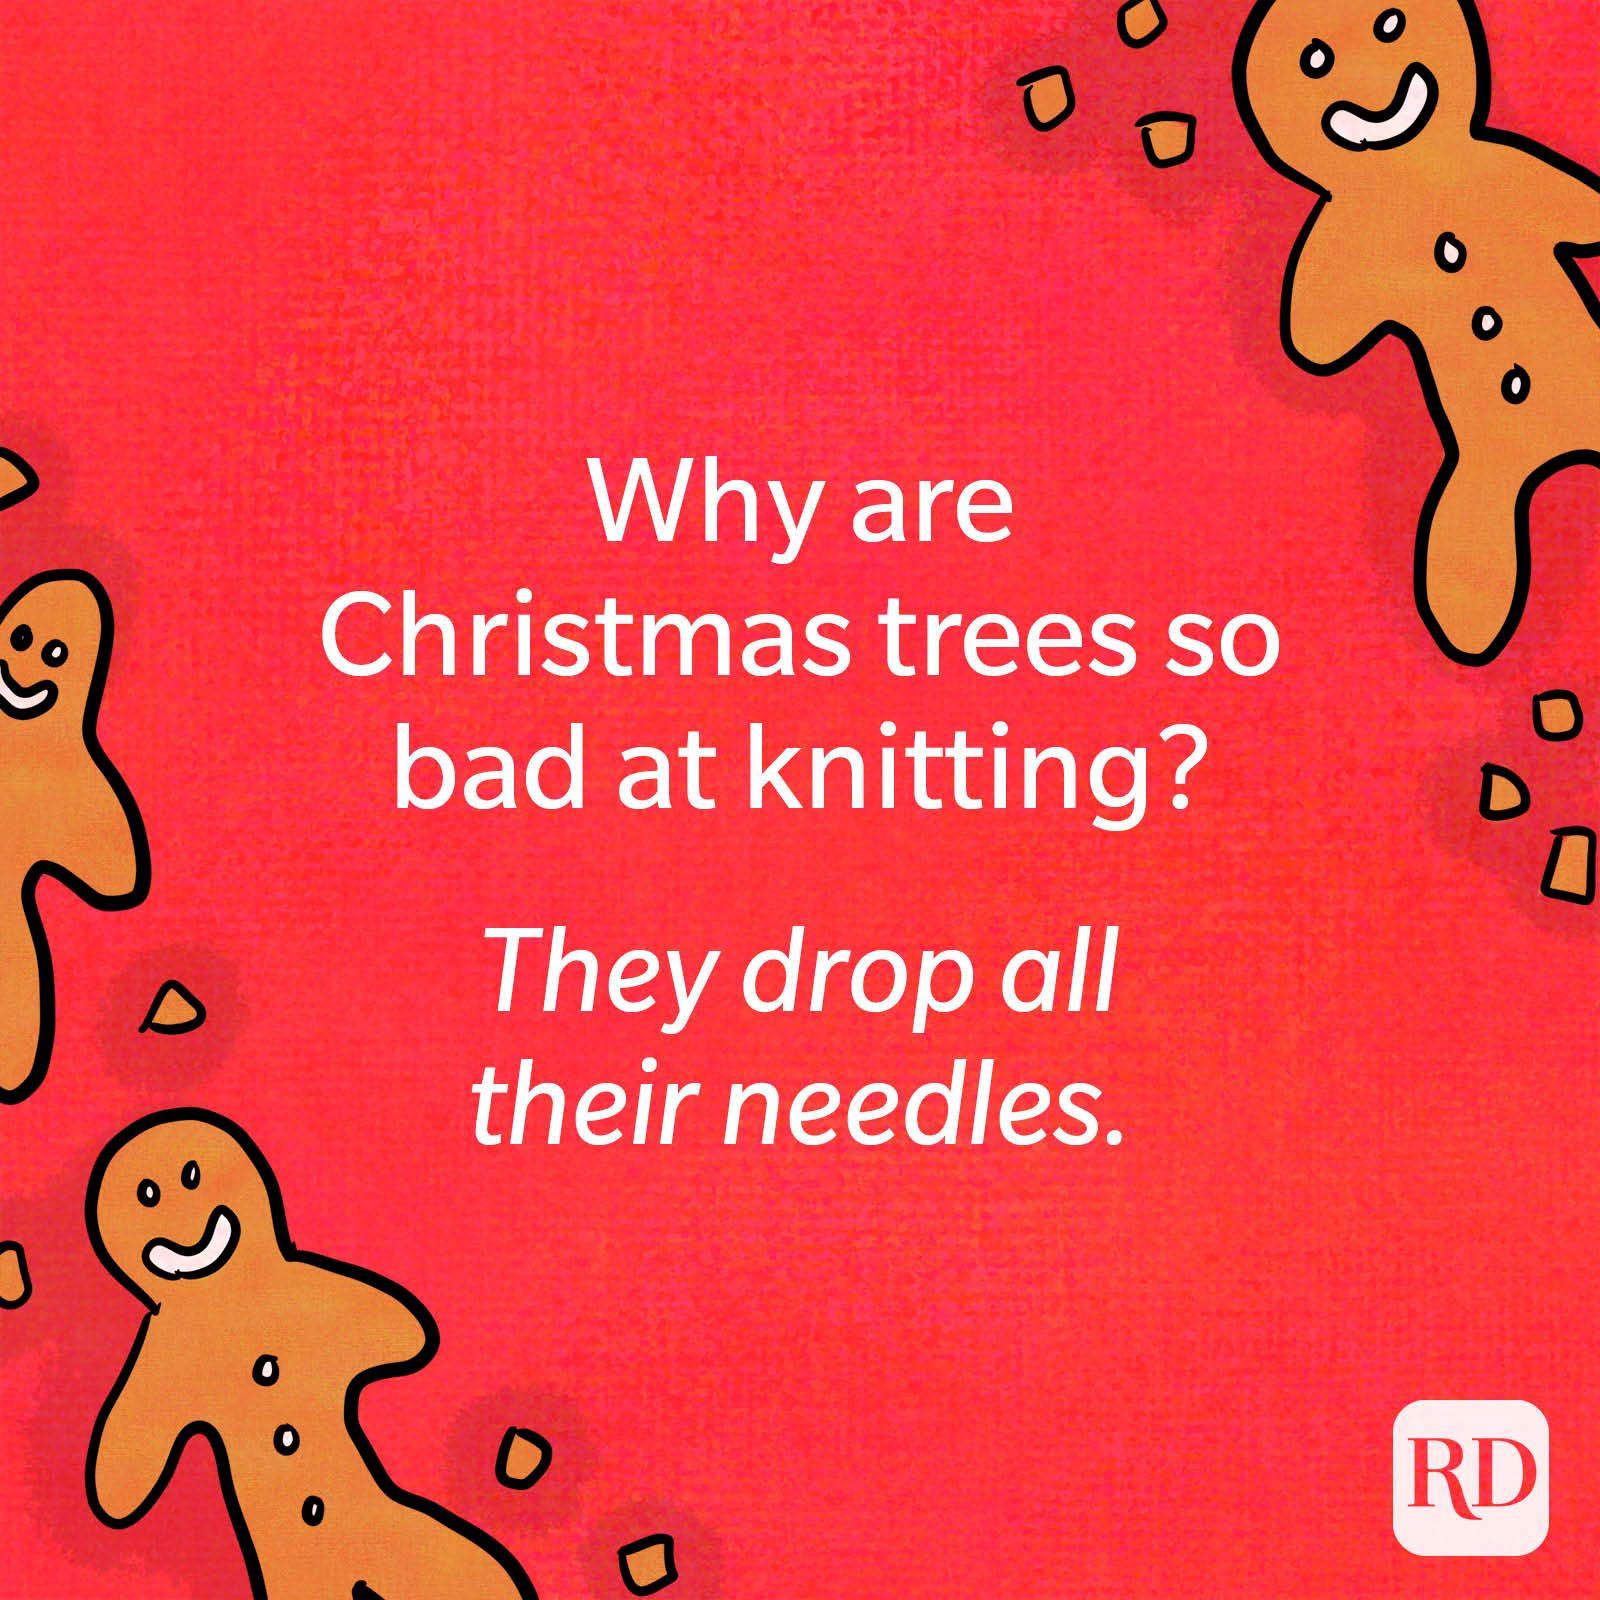 Why are Christmas trees so bad at knitting?